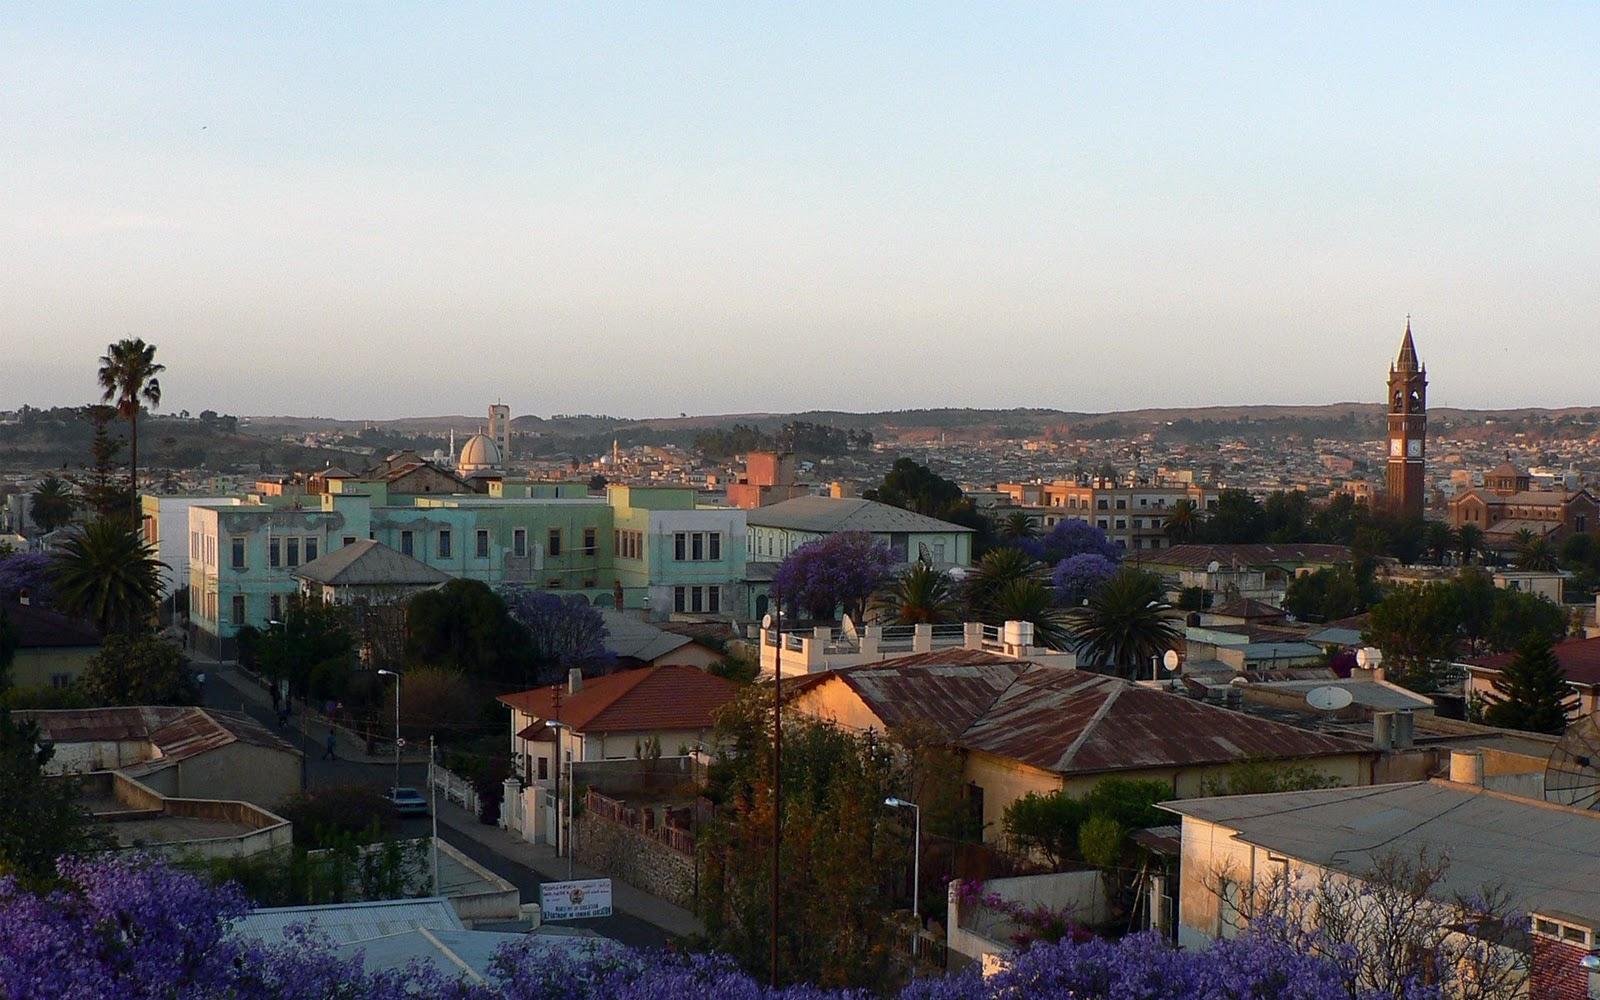 Eritrea's capital city Asmara - Sensi Seeds Blog